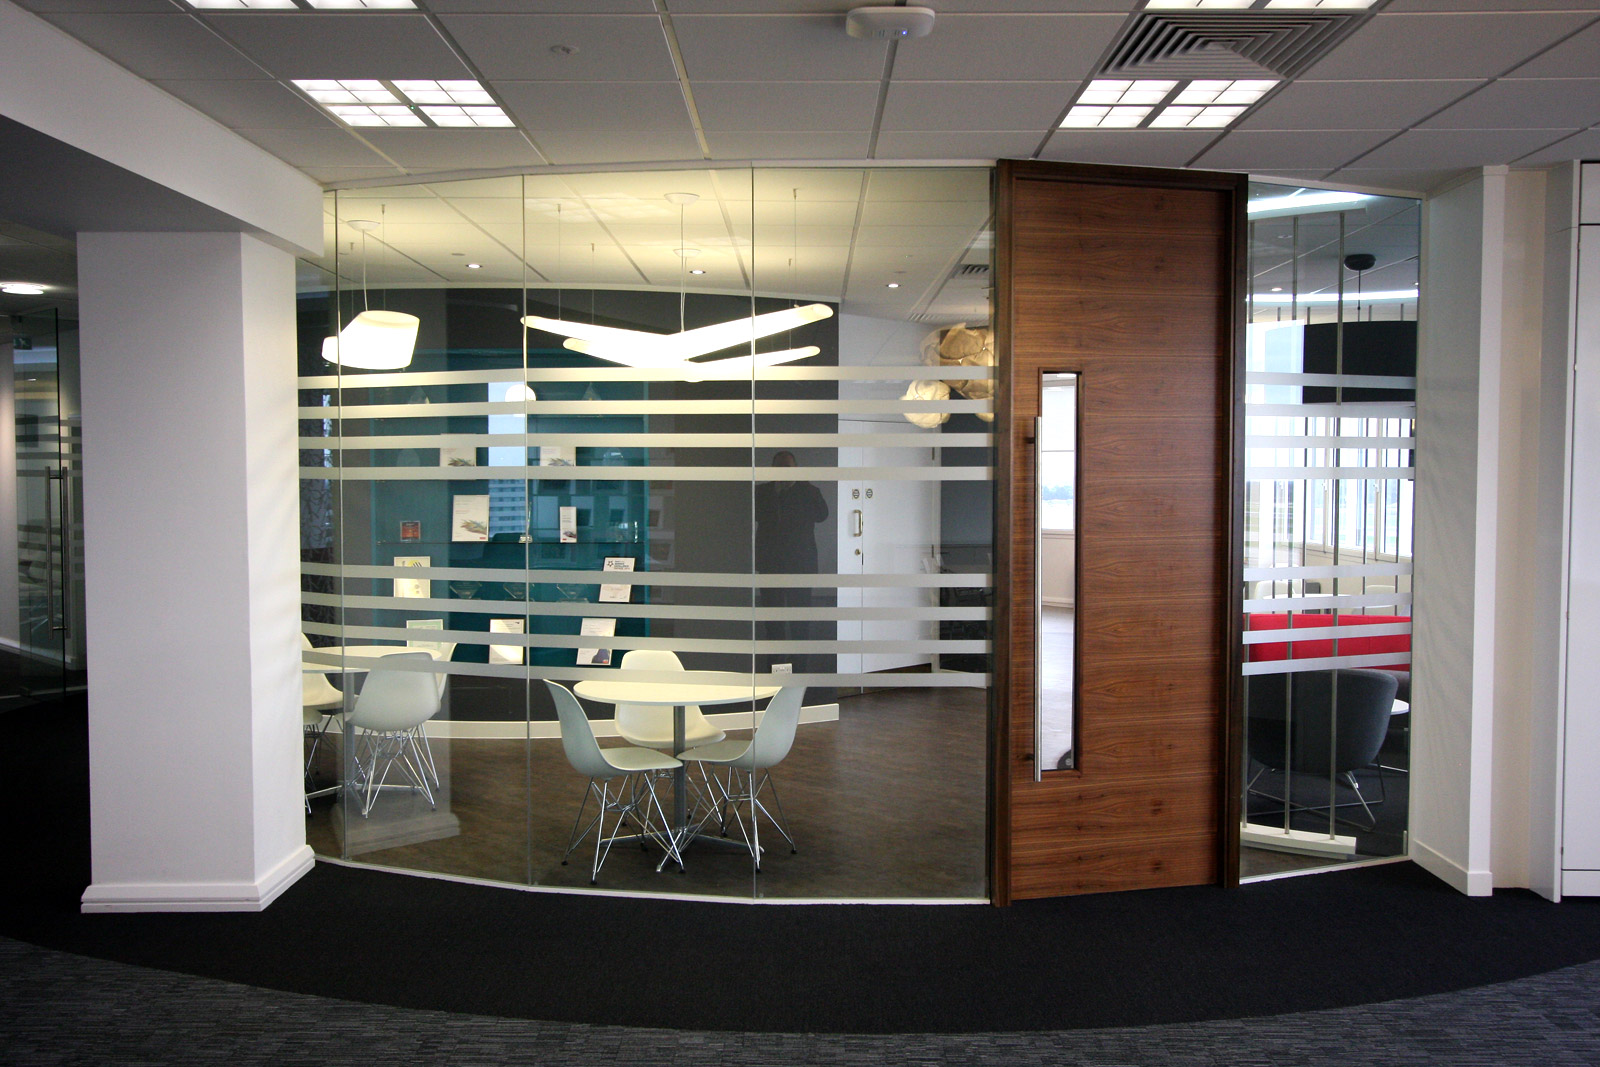 Office Partitioning in Birmingham, Midlands